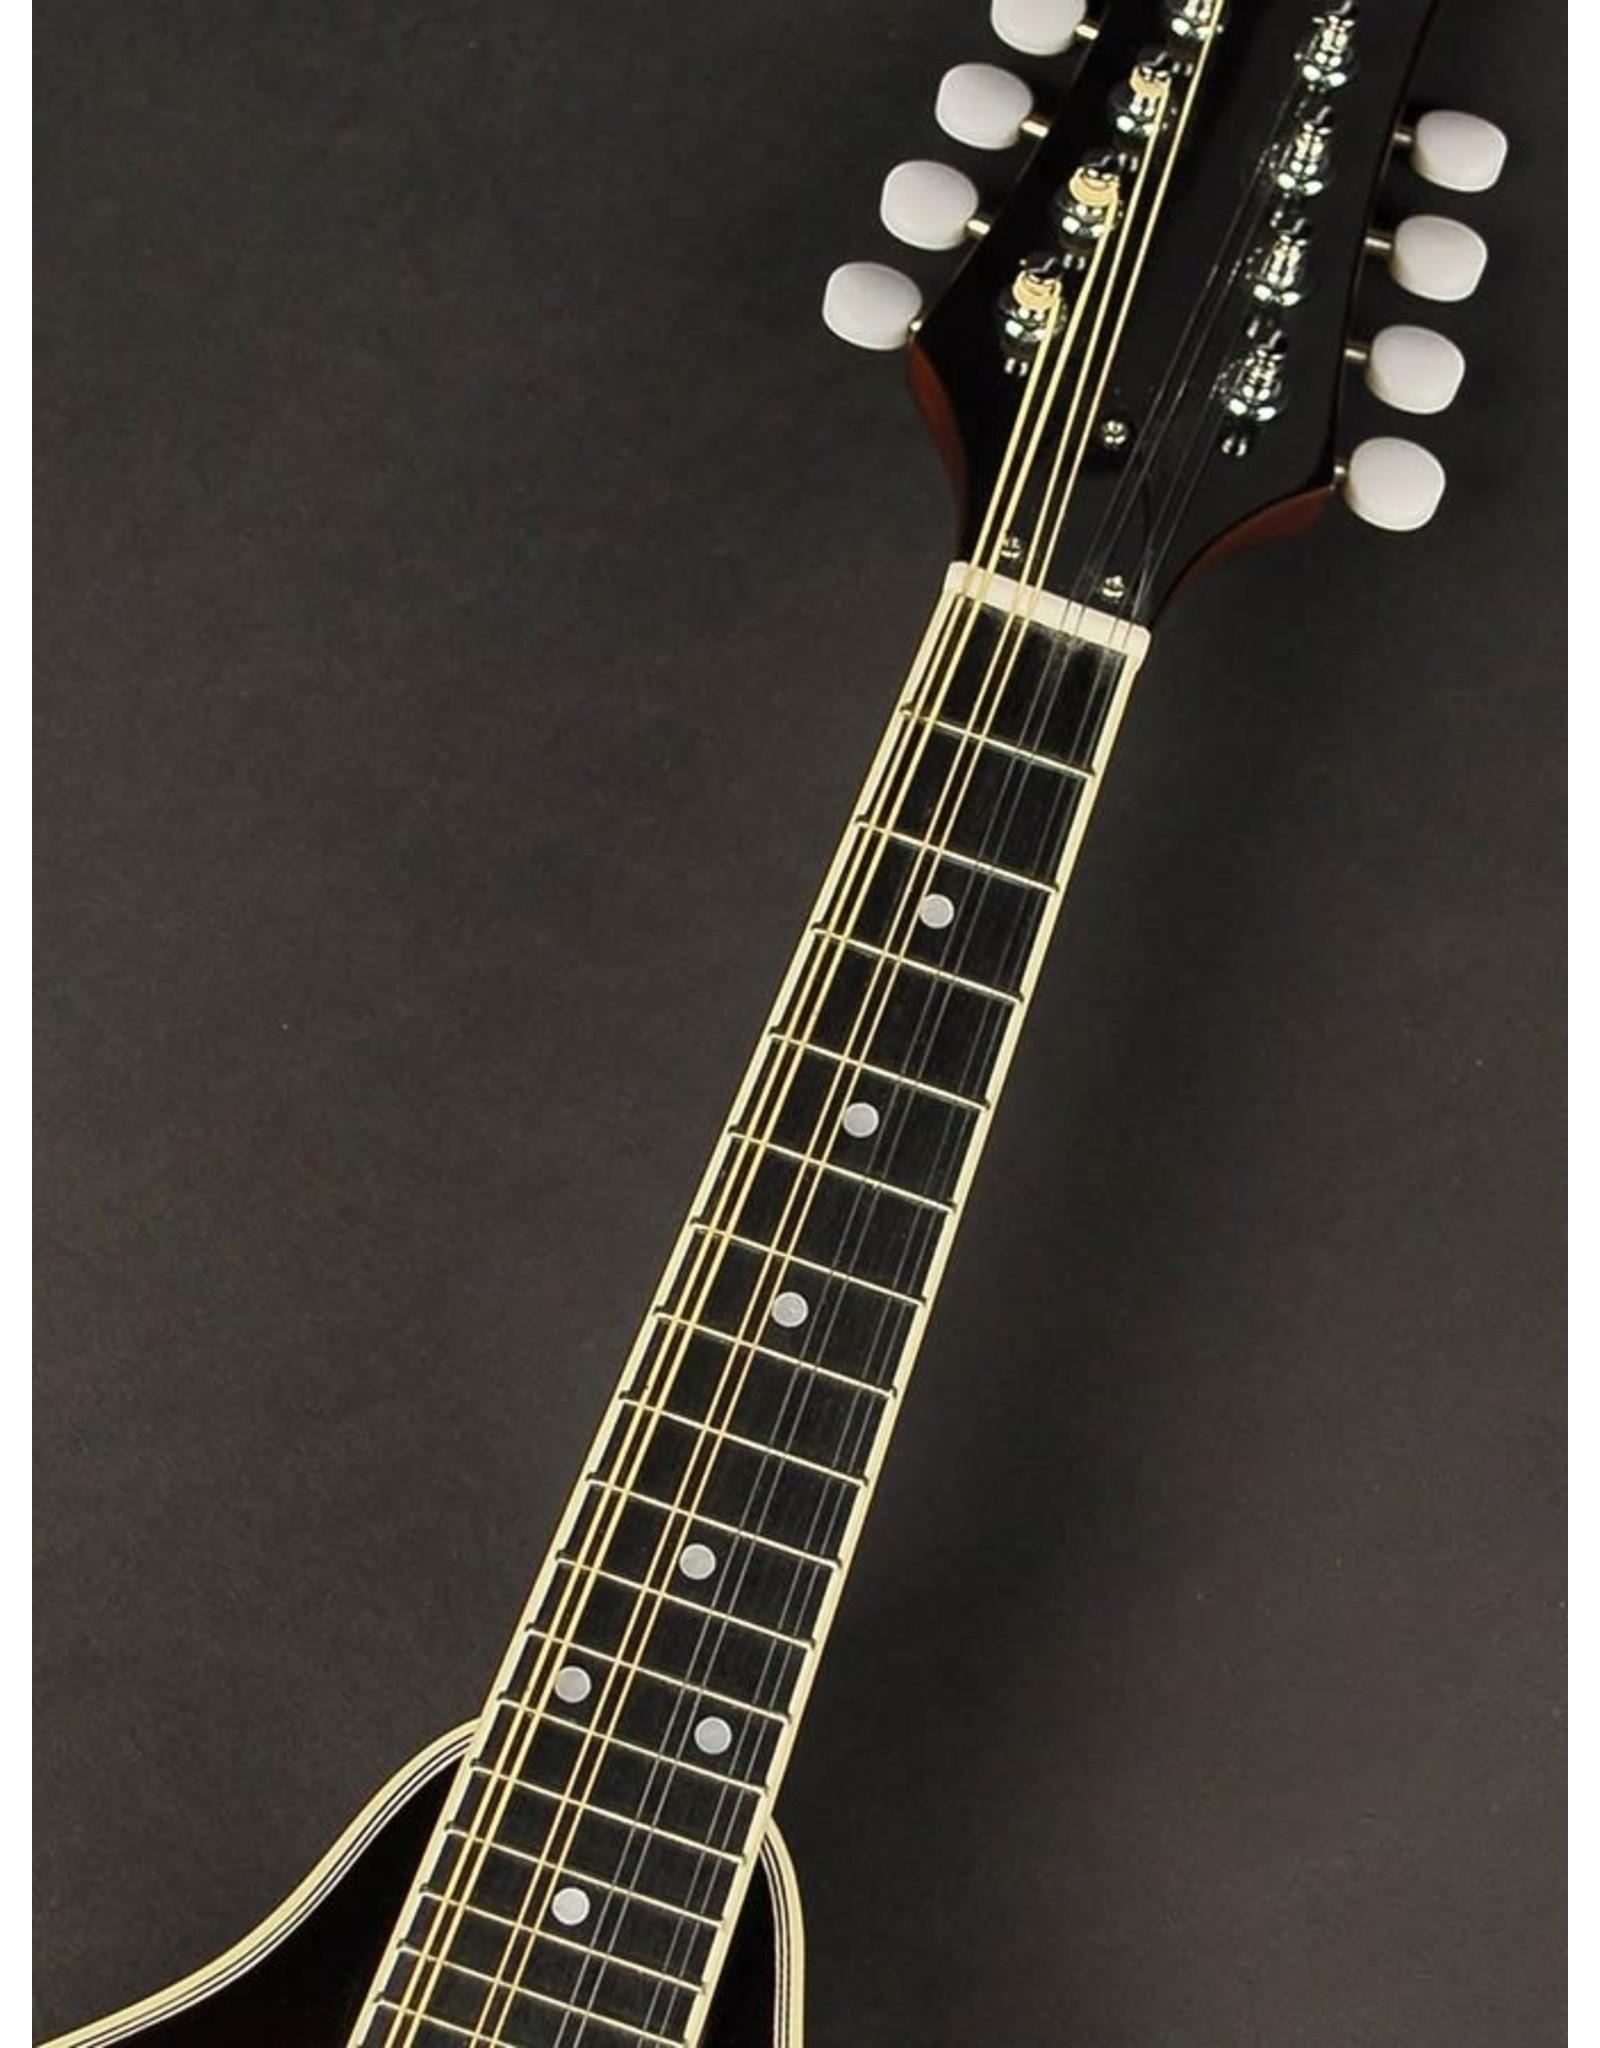 Boston Richwood RMA 60 VS Master Series mandoline A-style